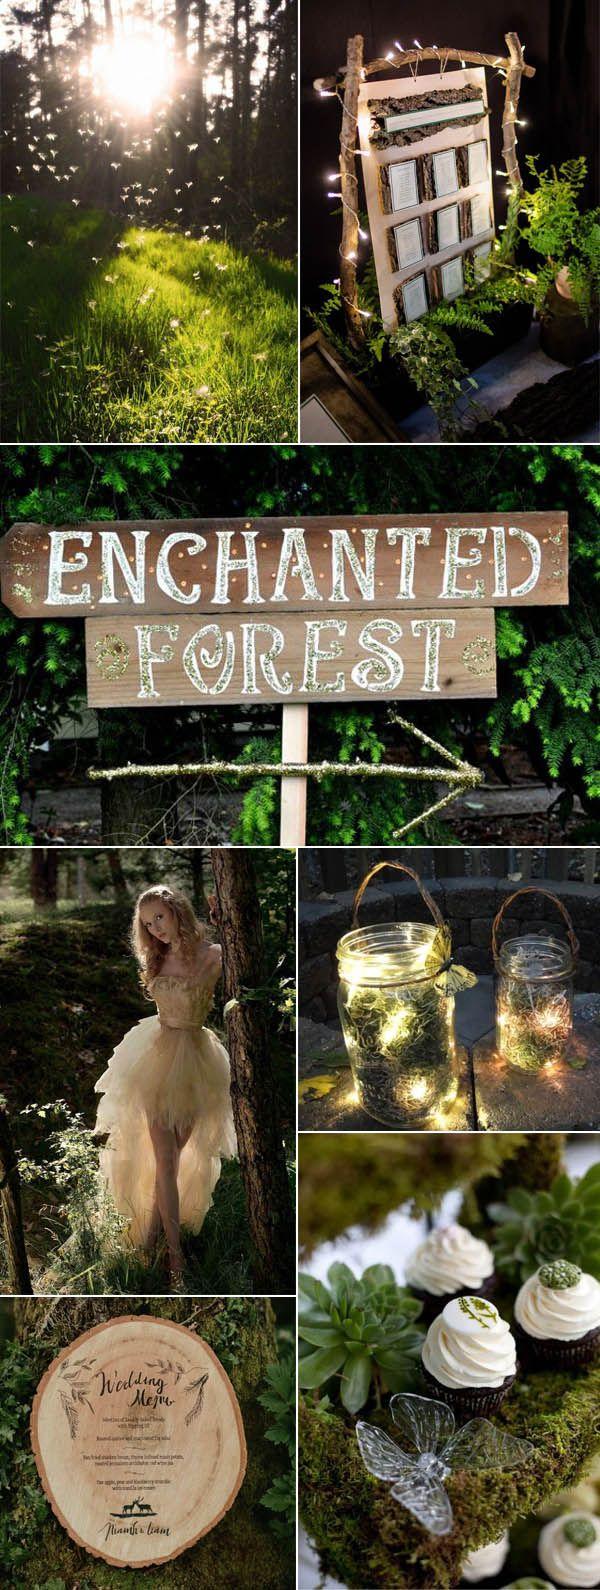 Best 25 enchanted forest wedding ideas on pinterest enchanted enchanted forest wedding ideas for 2017 brides junglespirit Images